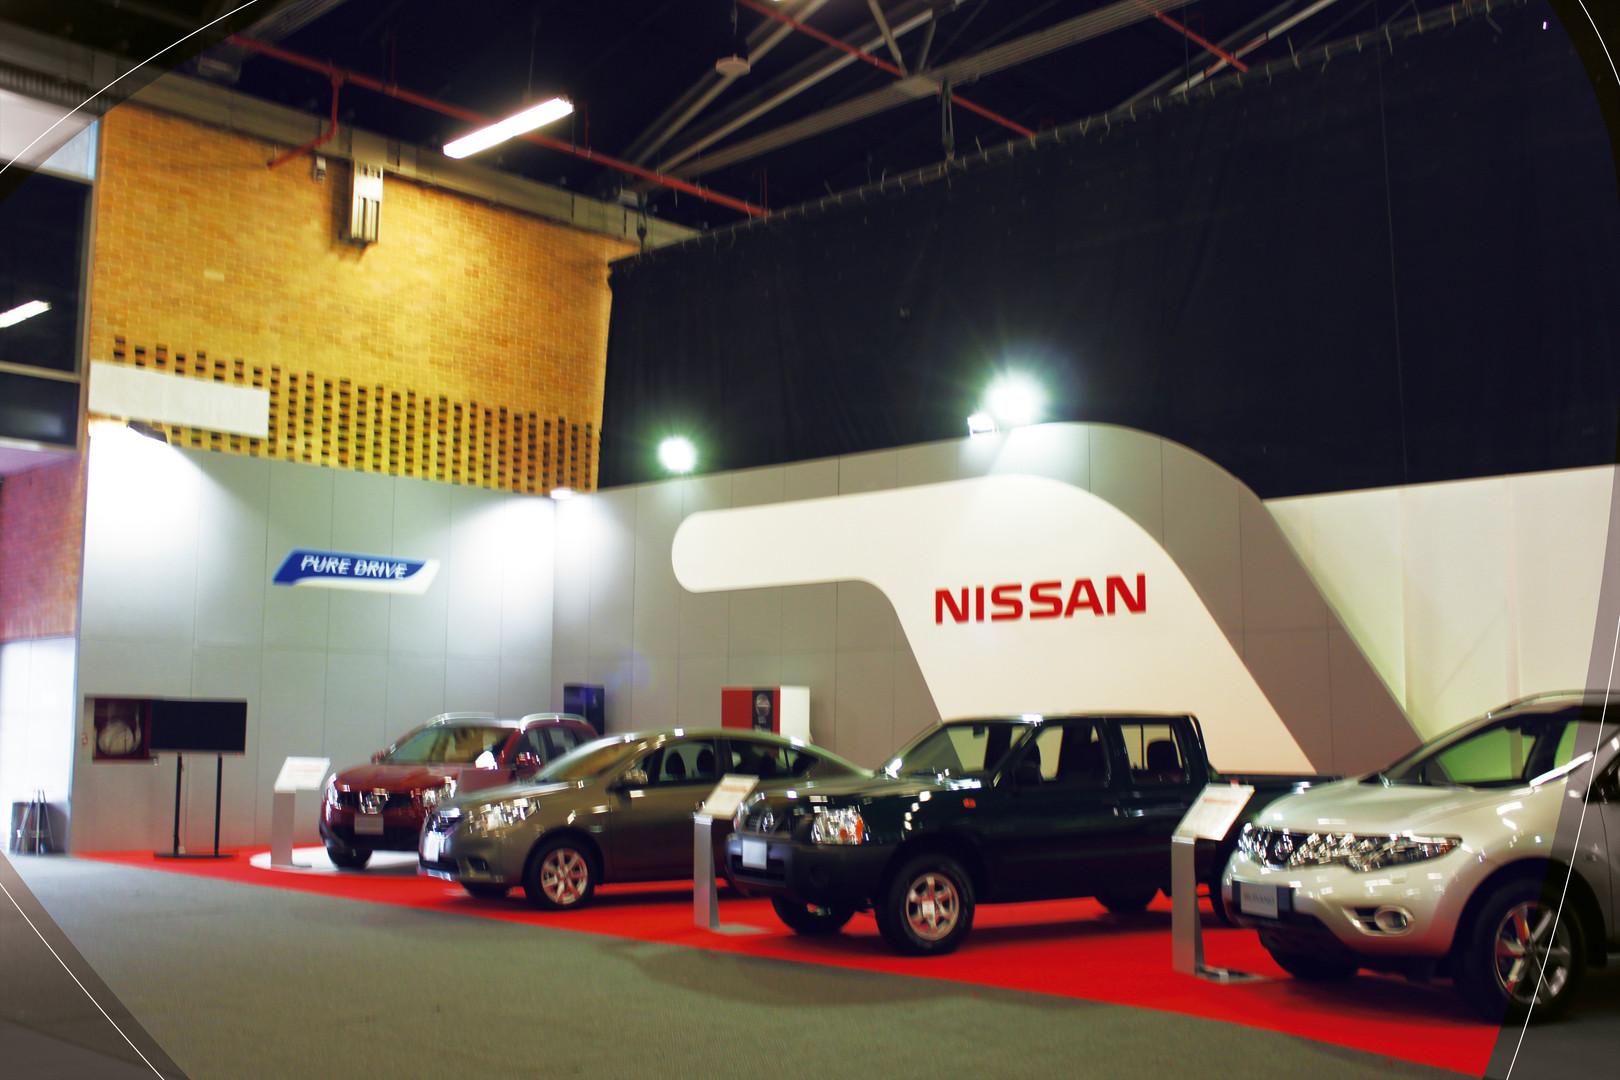 Nissan IMG_7479.JPG